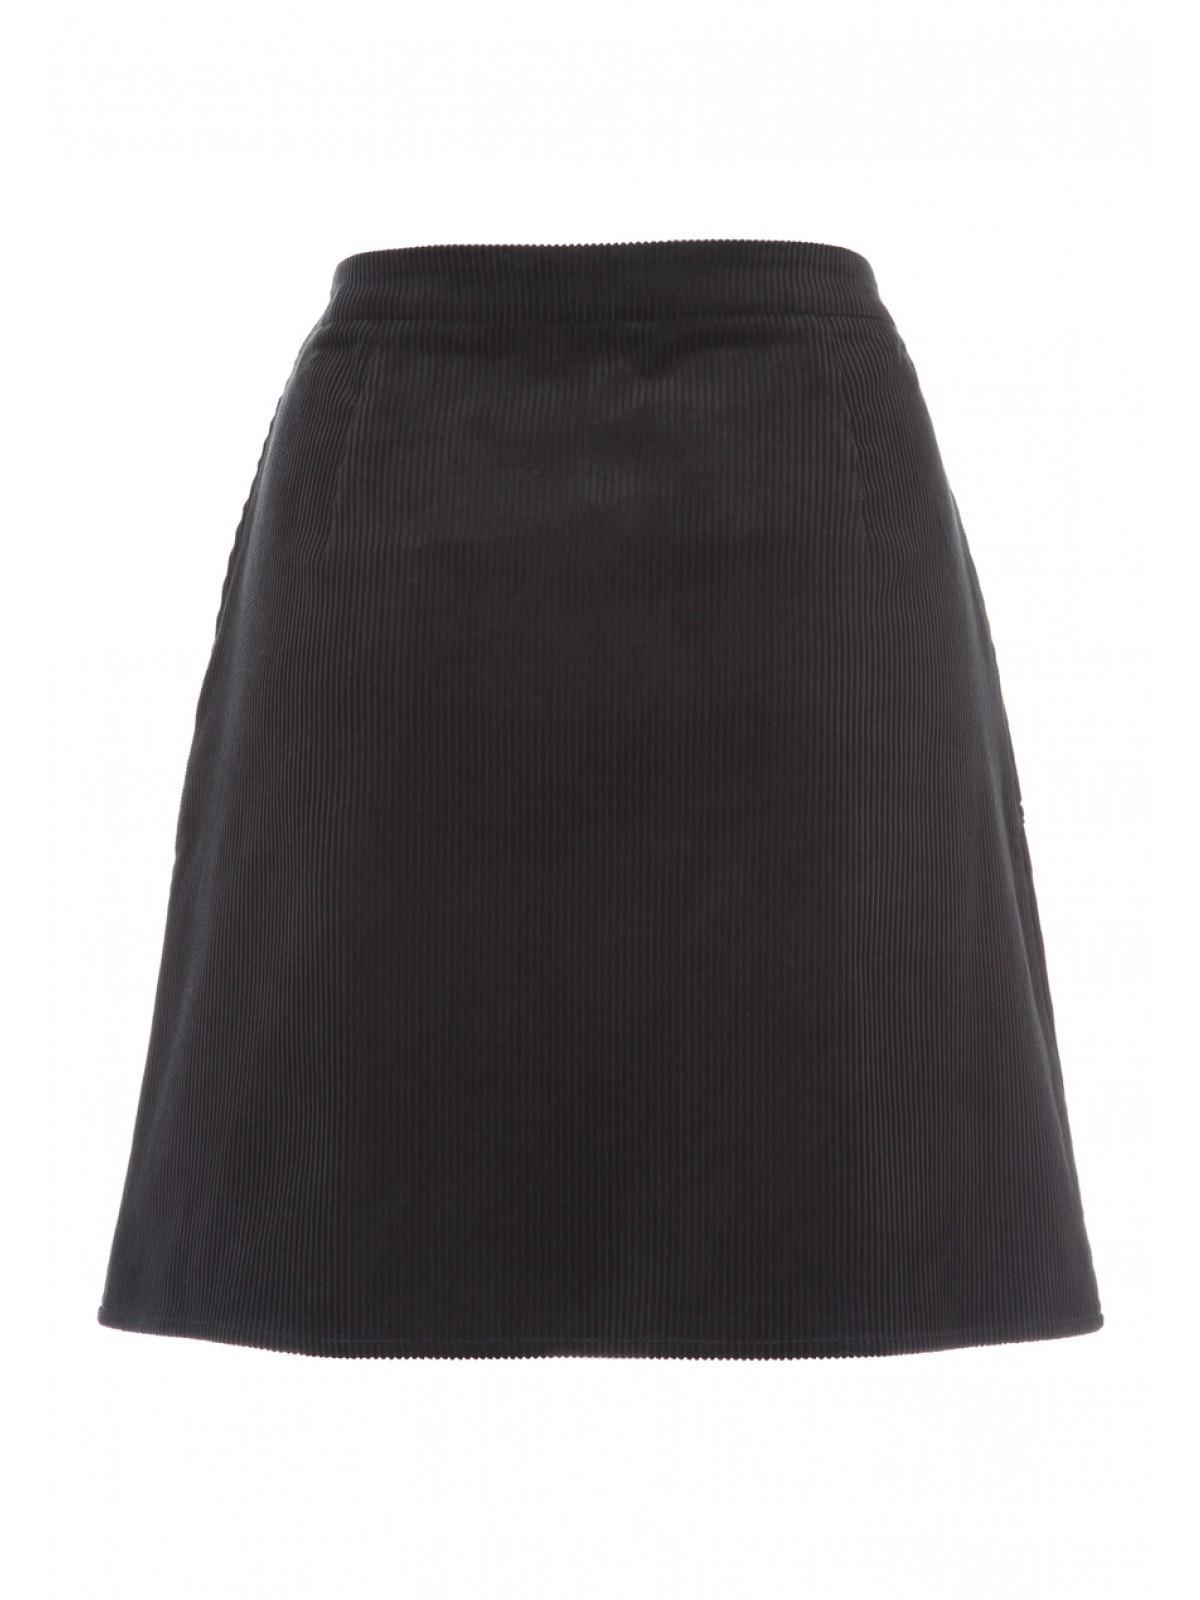 2510219e3c Womens A Line Cord Skirt   Peacocks